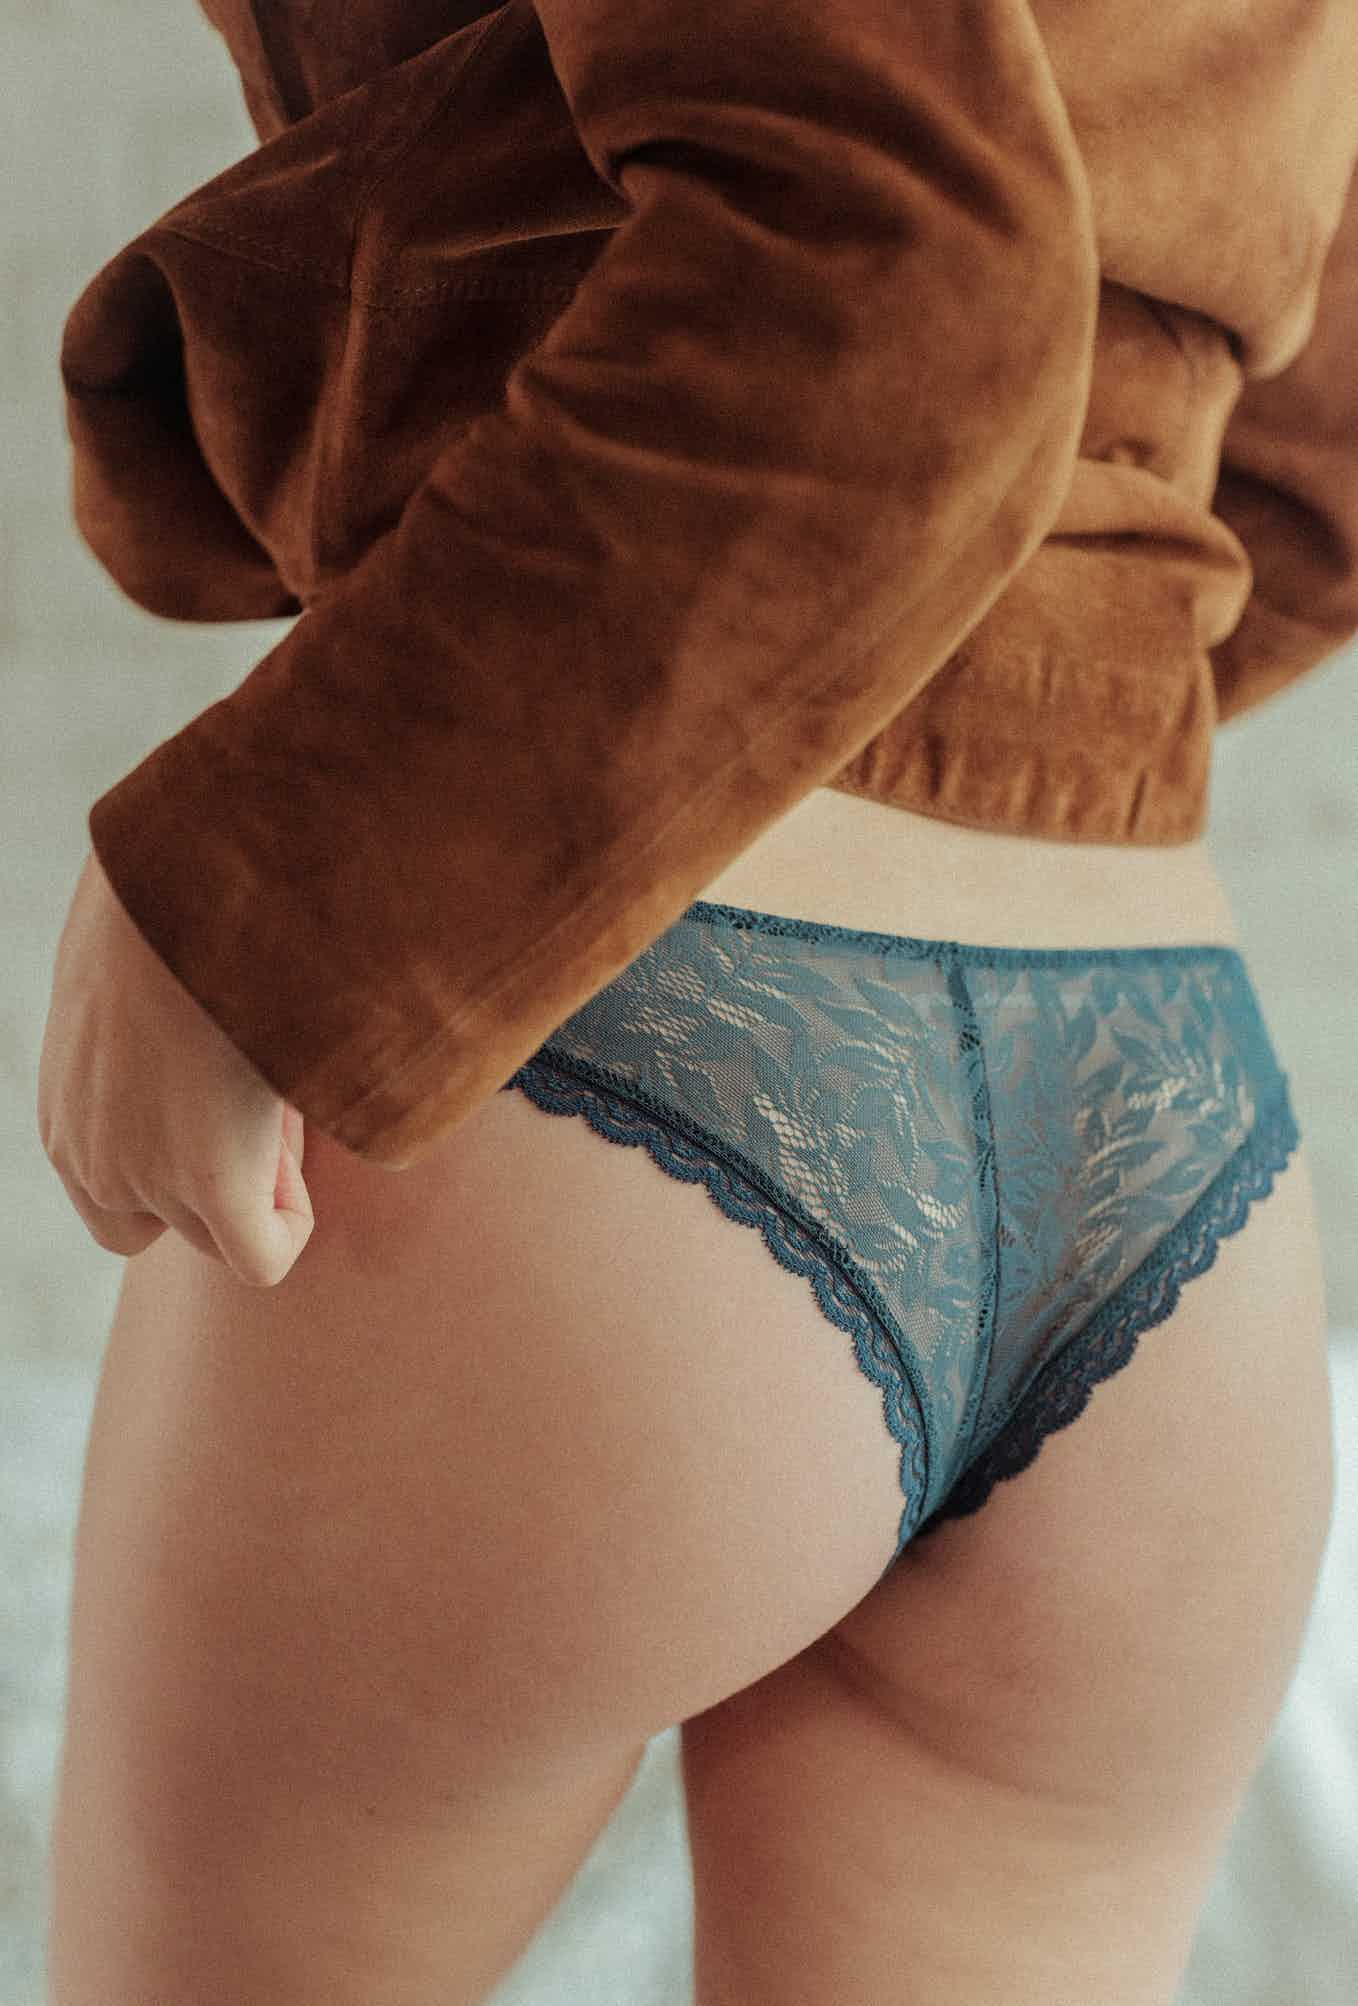 Les flots du coeur Tanga briefs teal blue